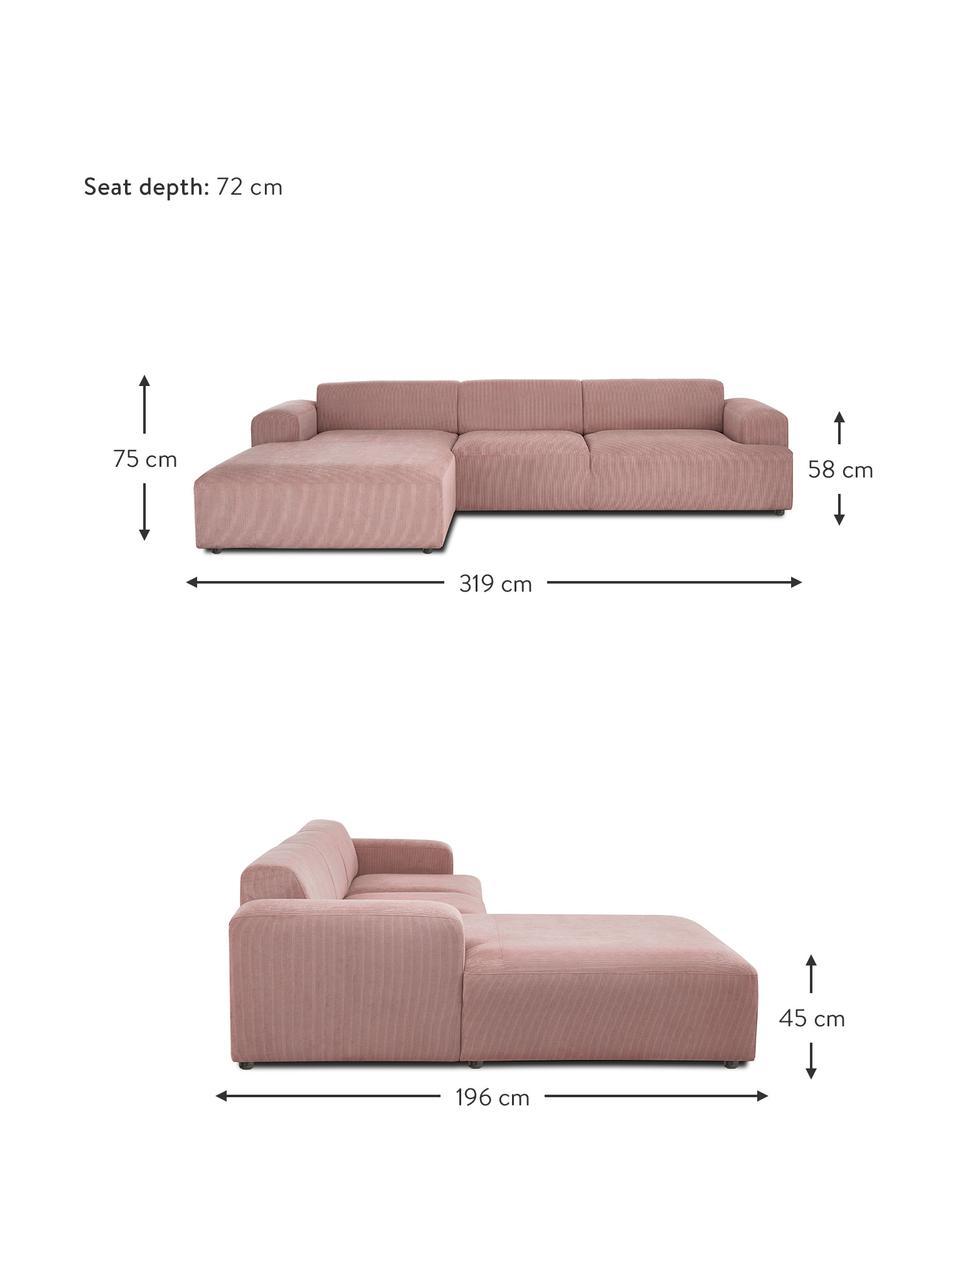 Ribfluwelen hoekbank Melva (4-zits) in roze, Bekleding: corduroy (92% polyester, , Frame: massief grenenhout, FSC-g, Poten: kunststof, Corduroy roze, B 319 x D 196 cm